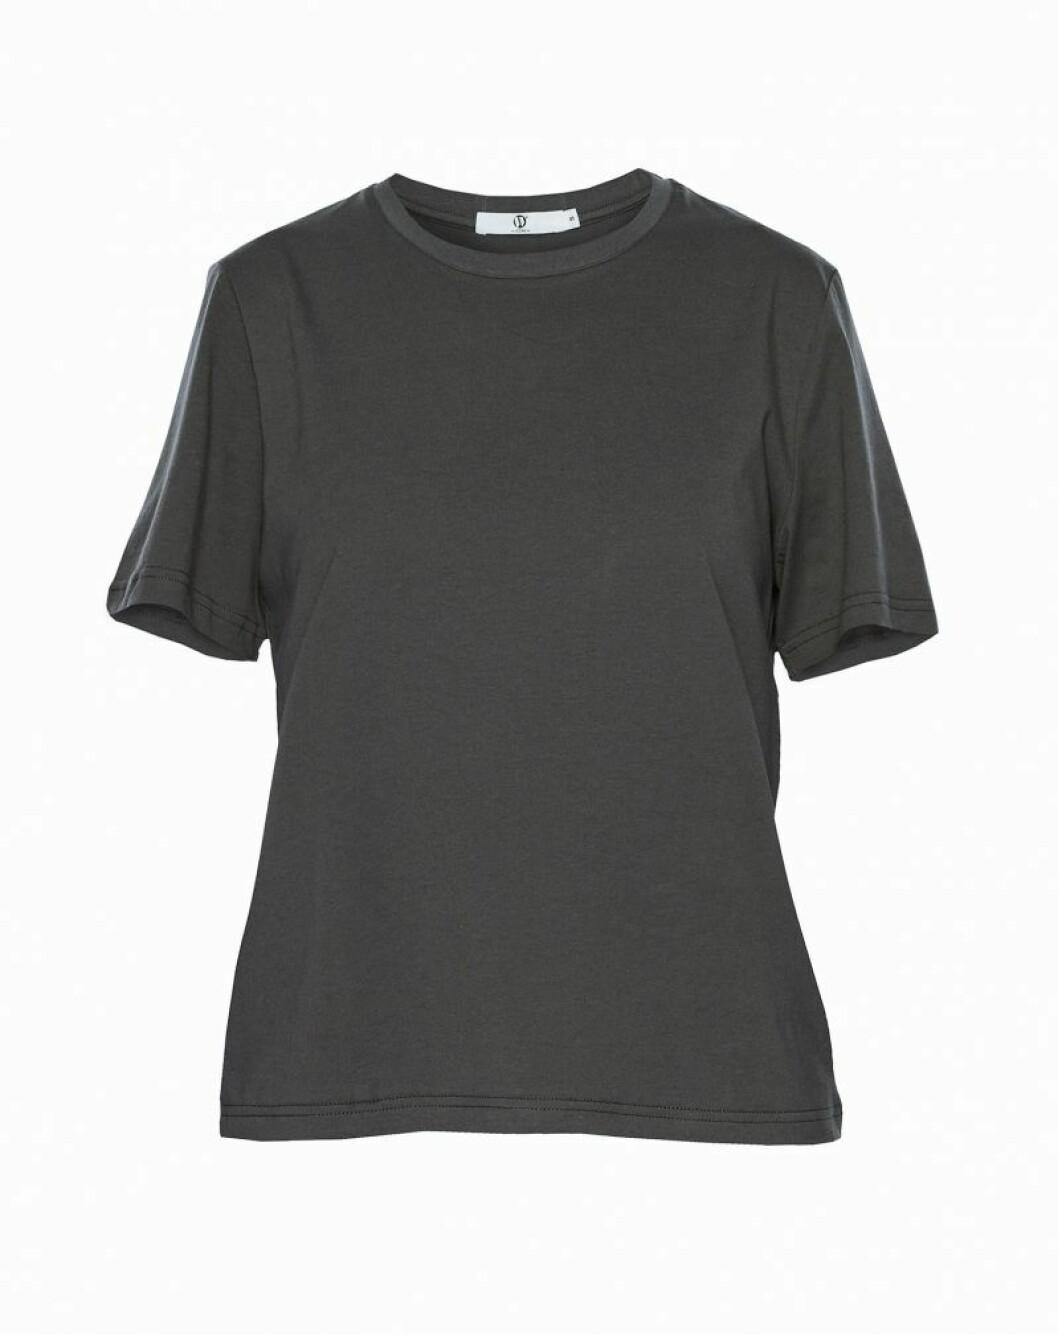 Wakakuu Icons vårkollektion: Grå t-shirt